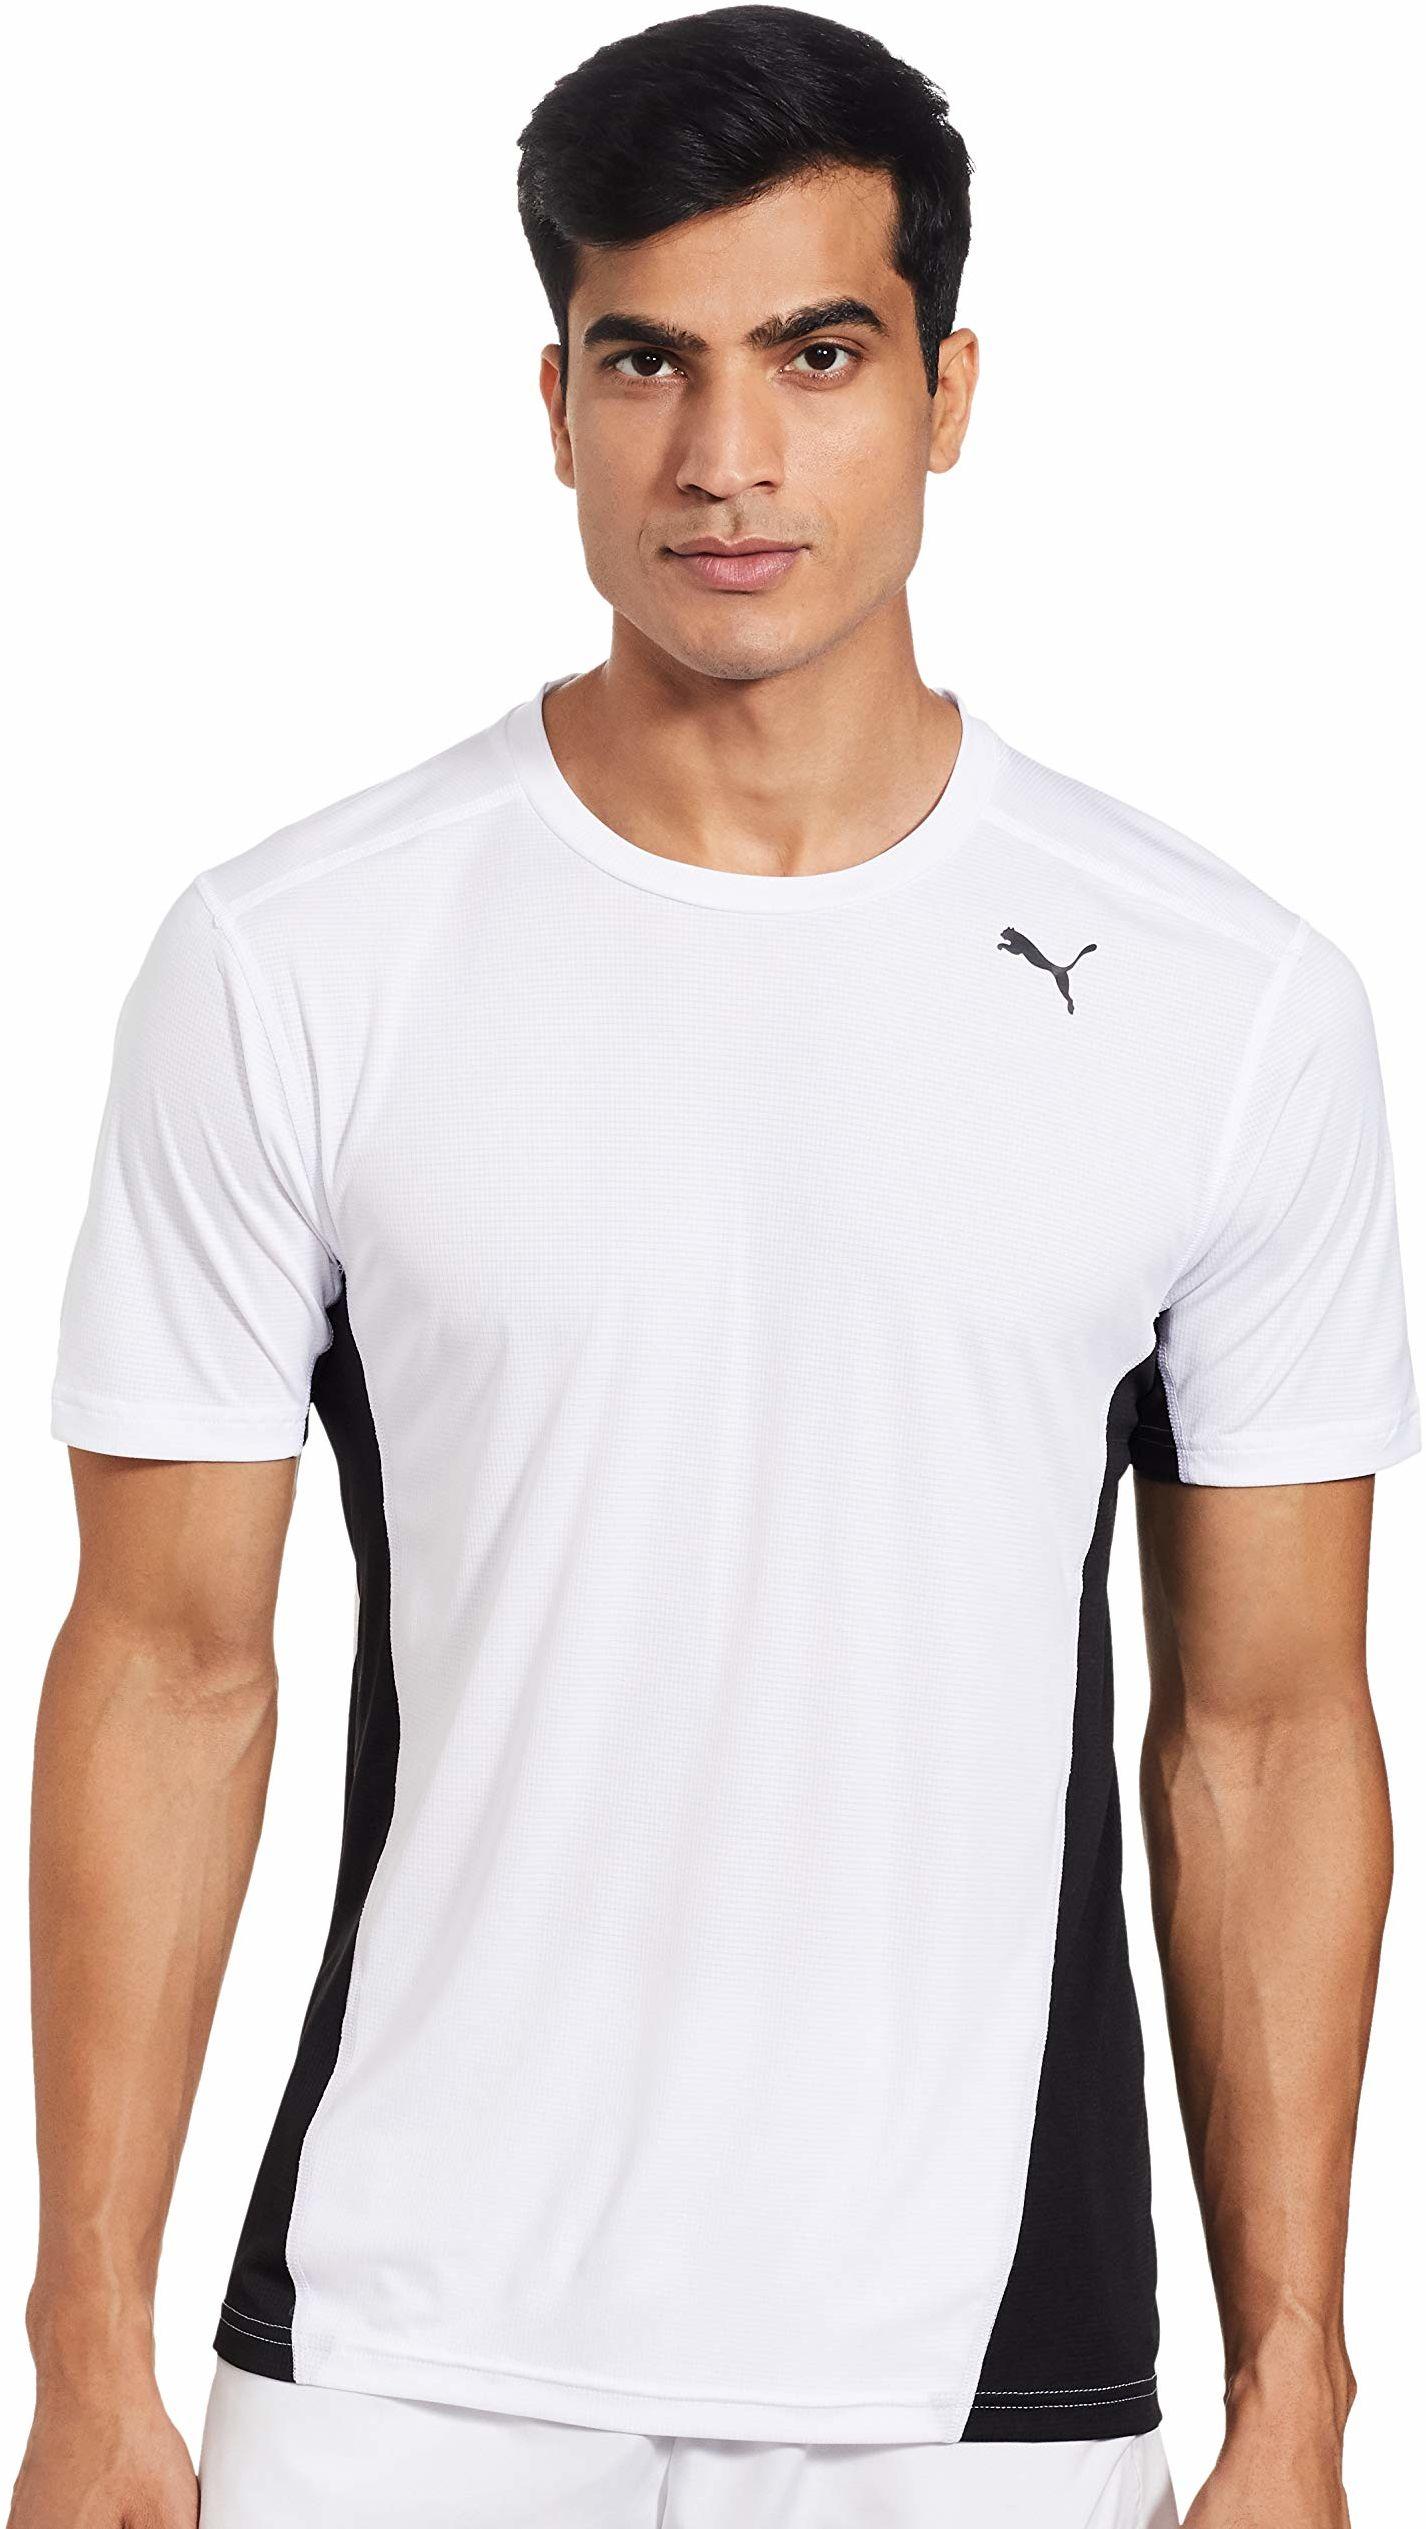 PUMA męska koszulka Cross the Line koszulka, biała czarna, mała